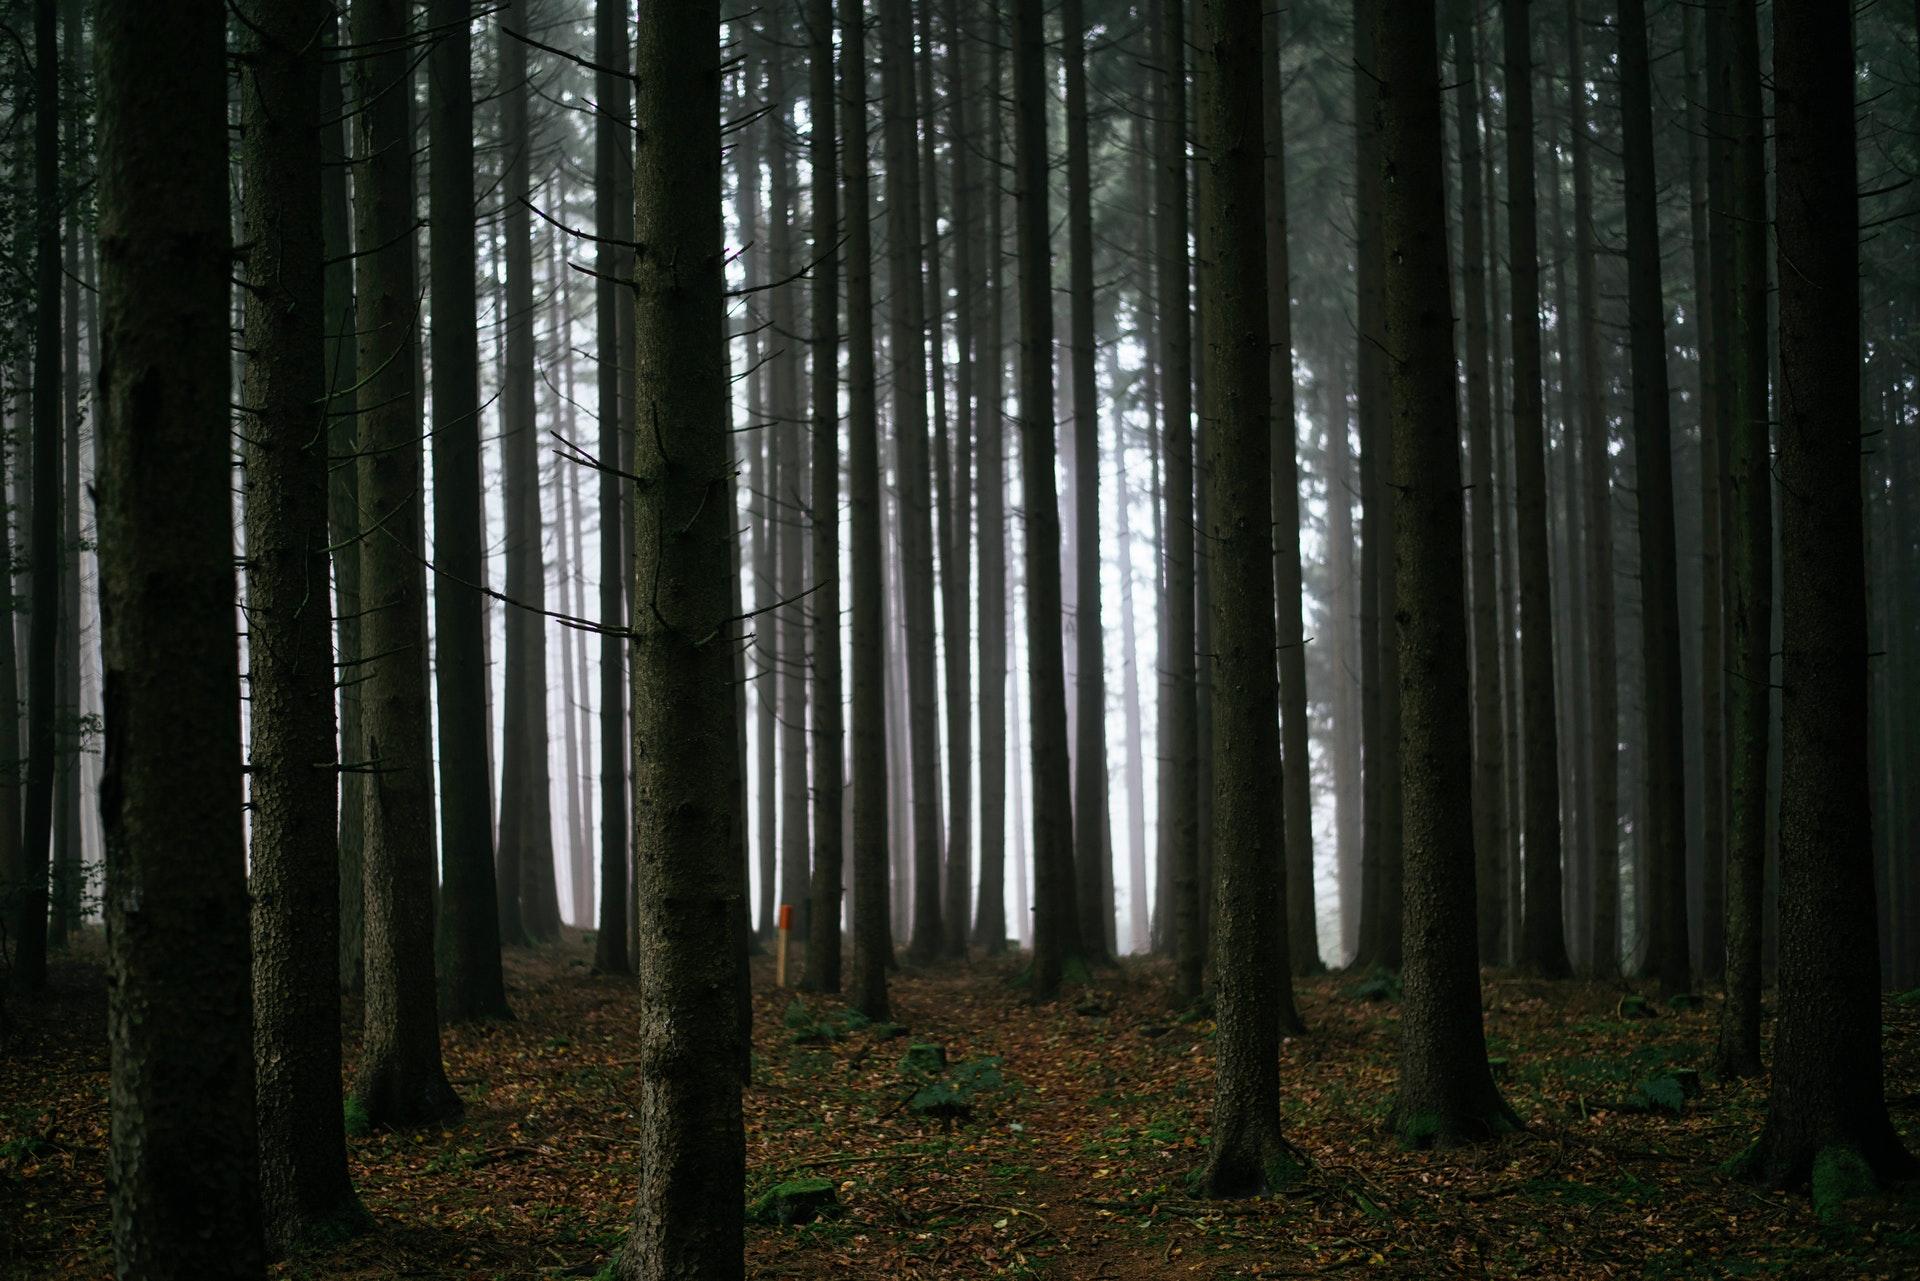 dark-forest-trees-6891.jpg